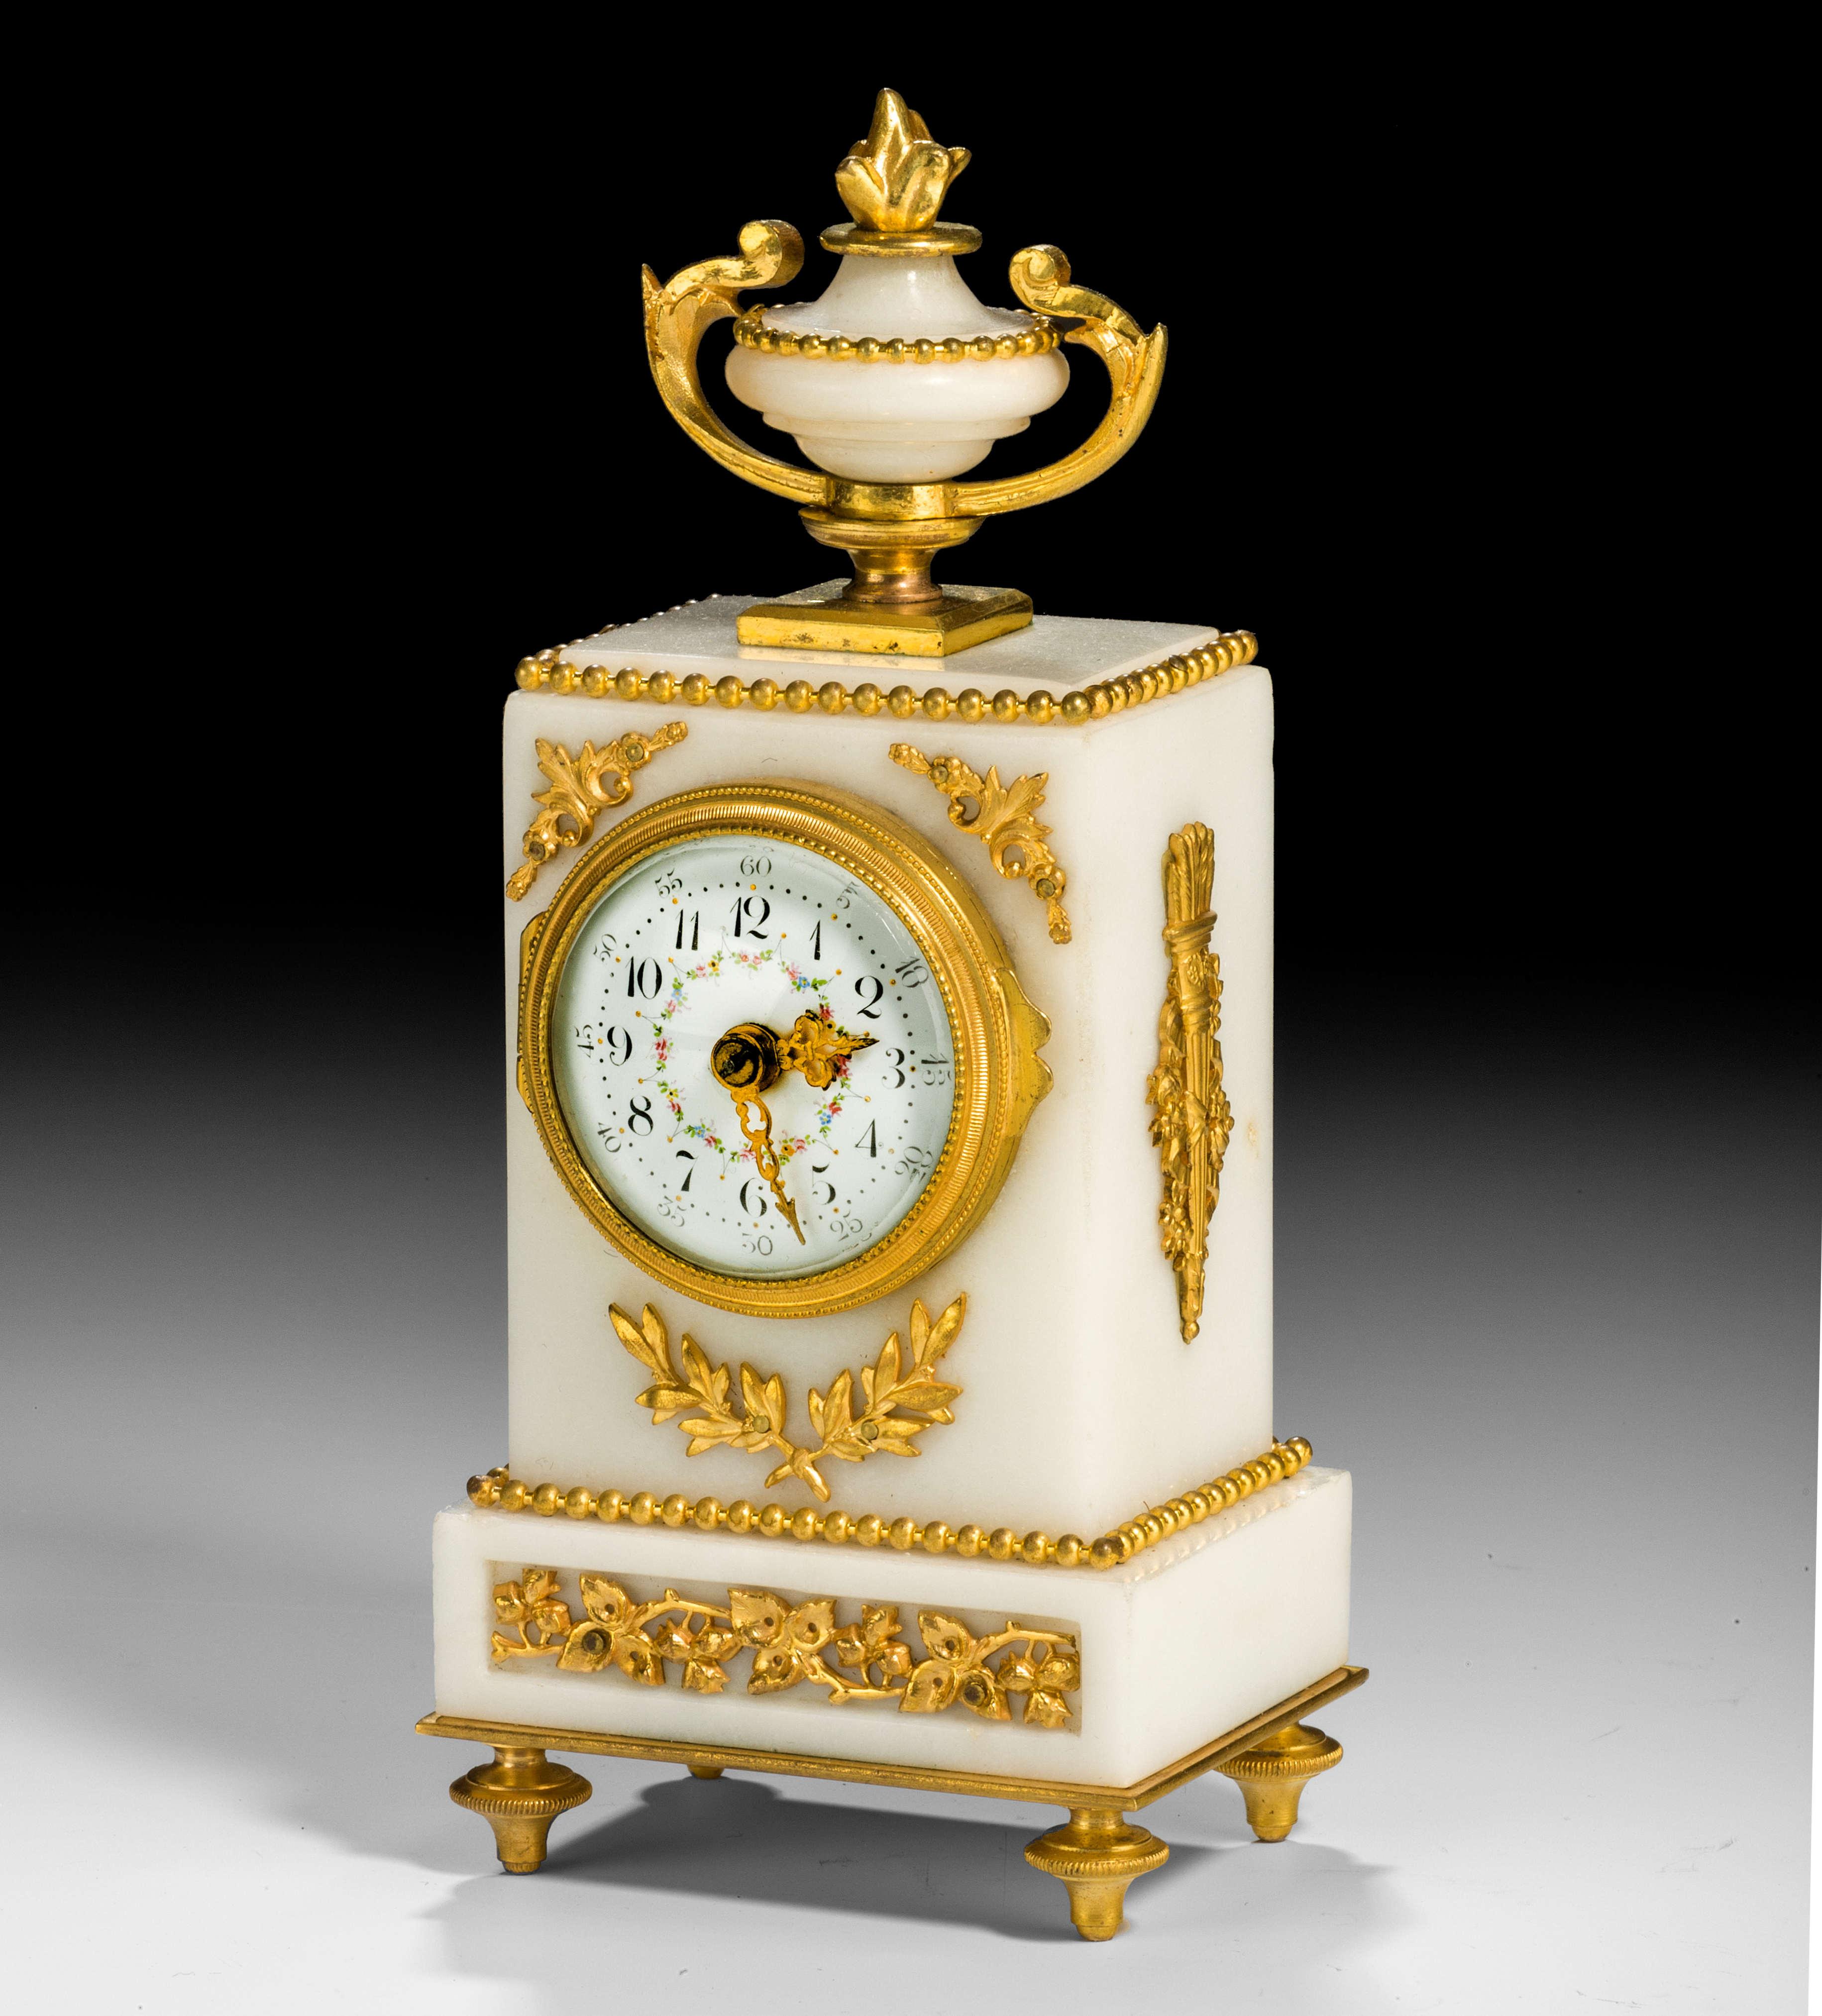 Antique Miniature White Marble Mantel Clock